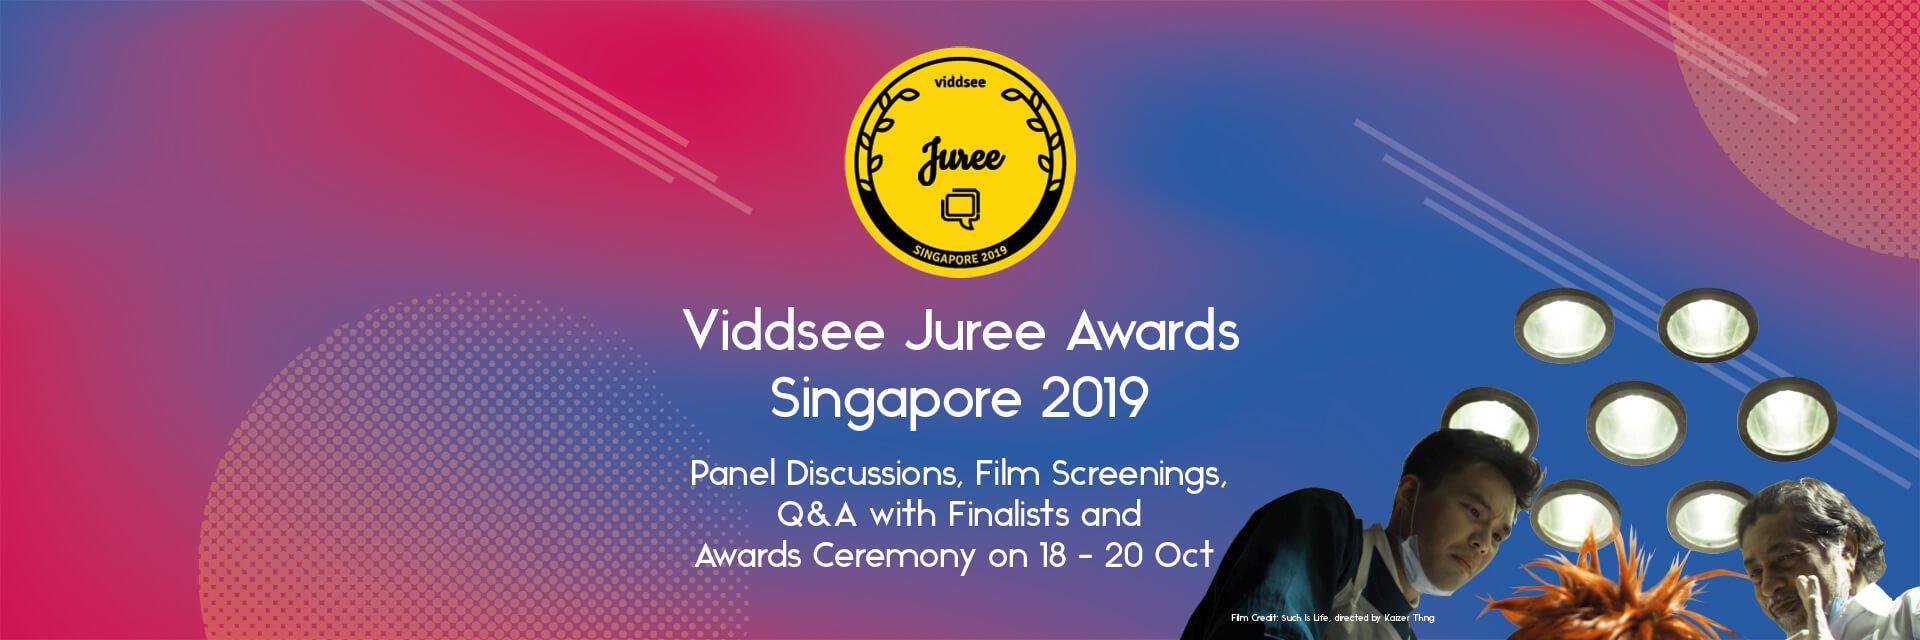 Viddsee Juree Awards   Viddsee